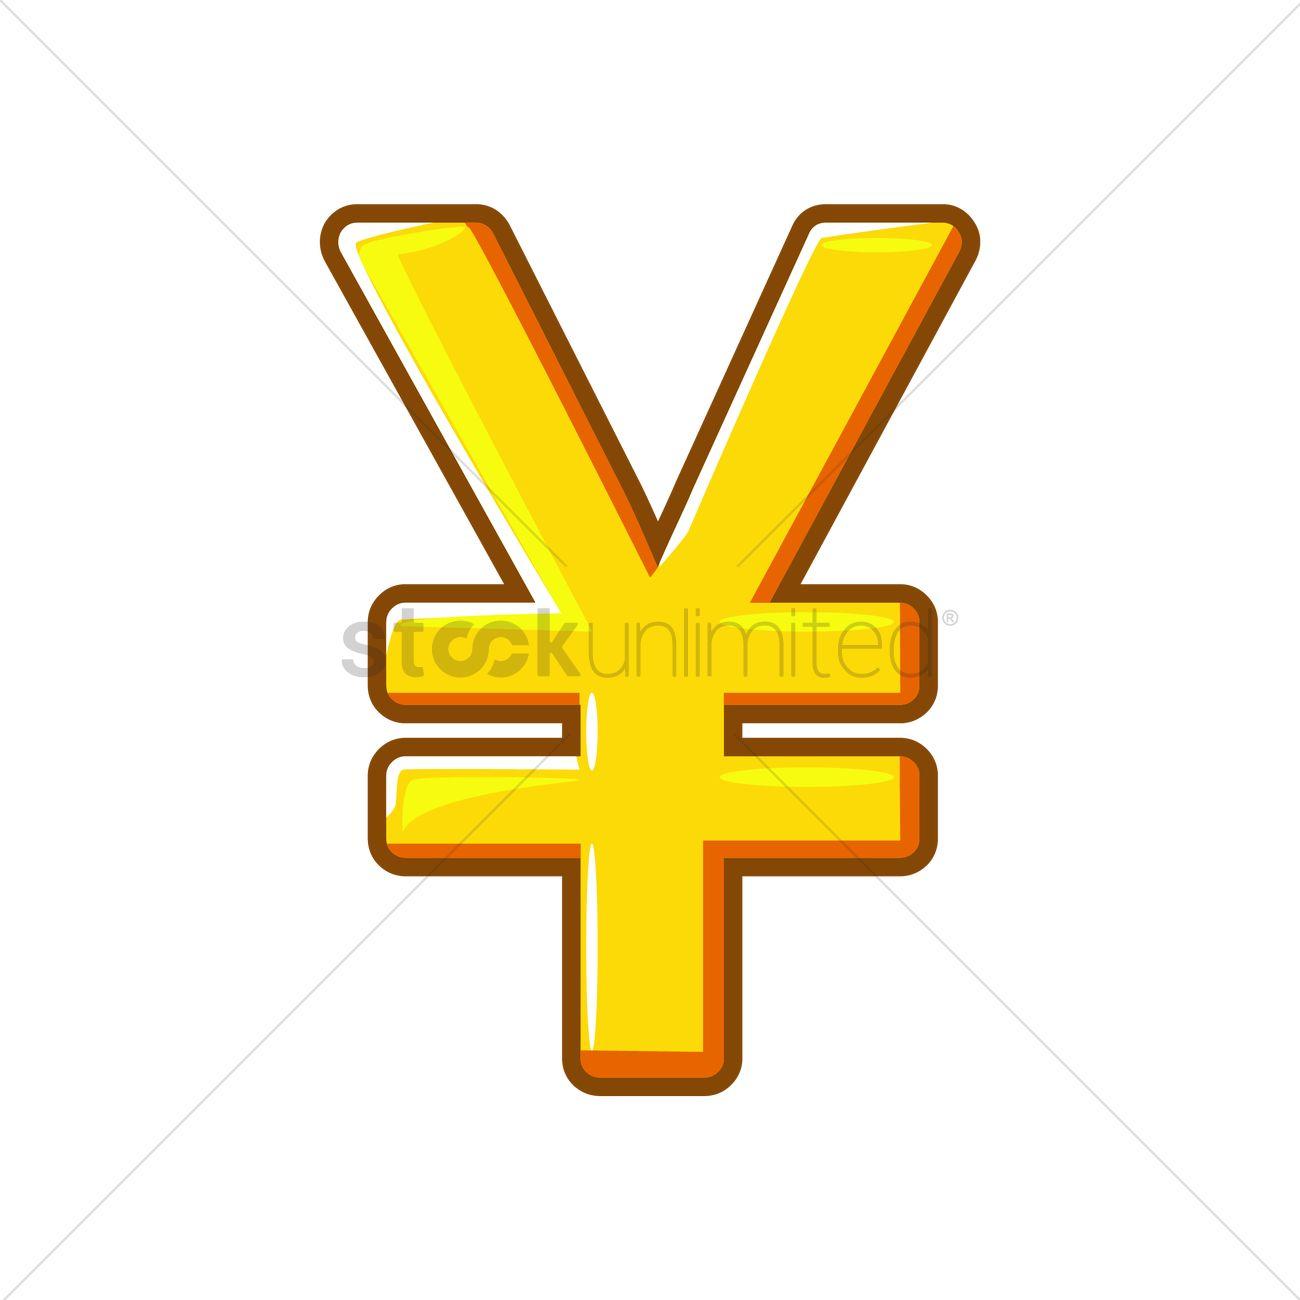 Yen currency symbol vector image 1296368 stockunlimited yen currency symbol vector graphic biocorpaavc